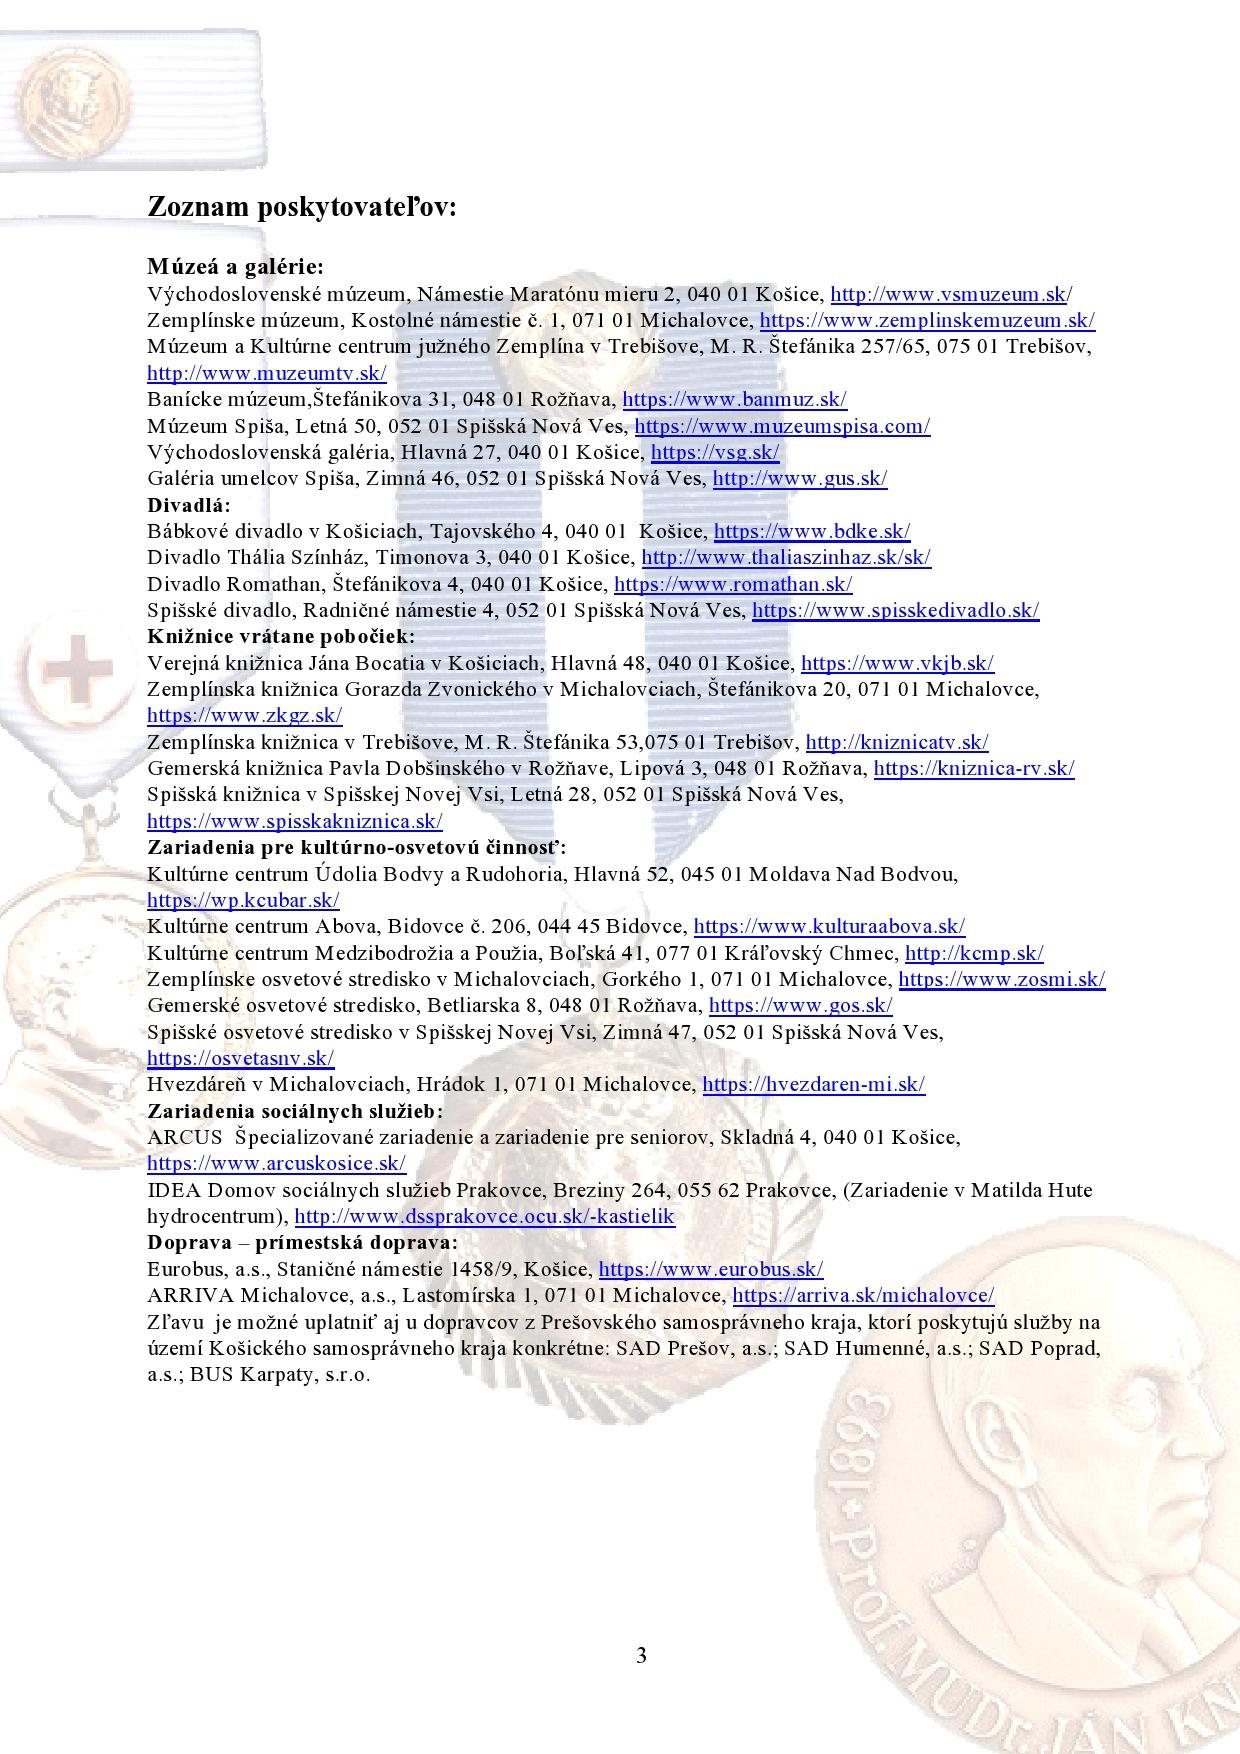 Benefity_poskytovatelia_zoznam-page0003